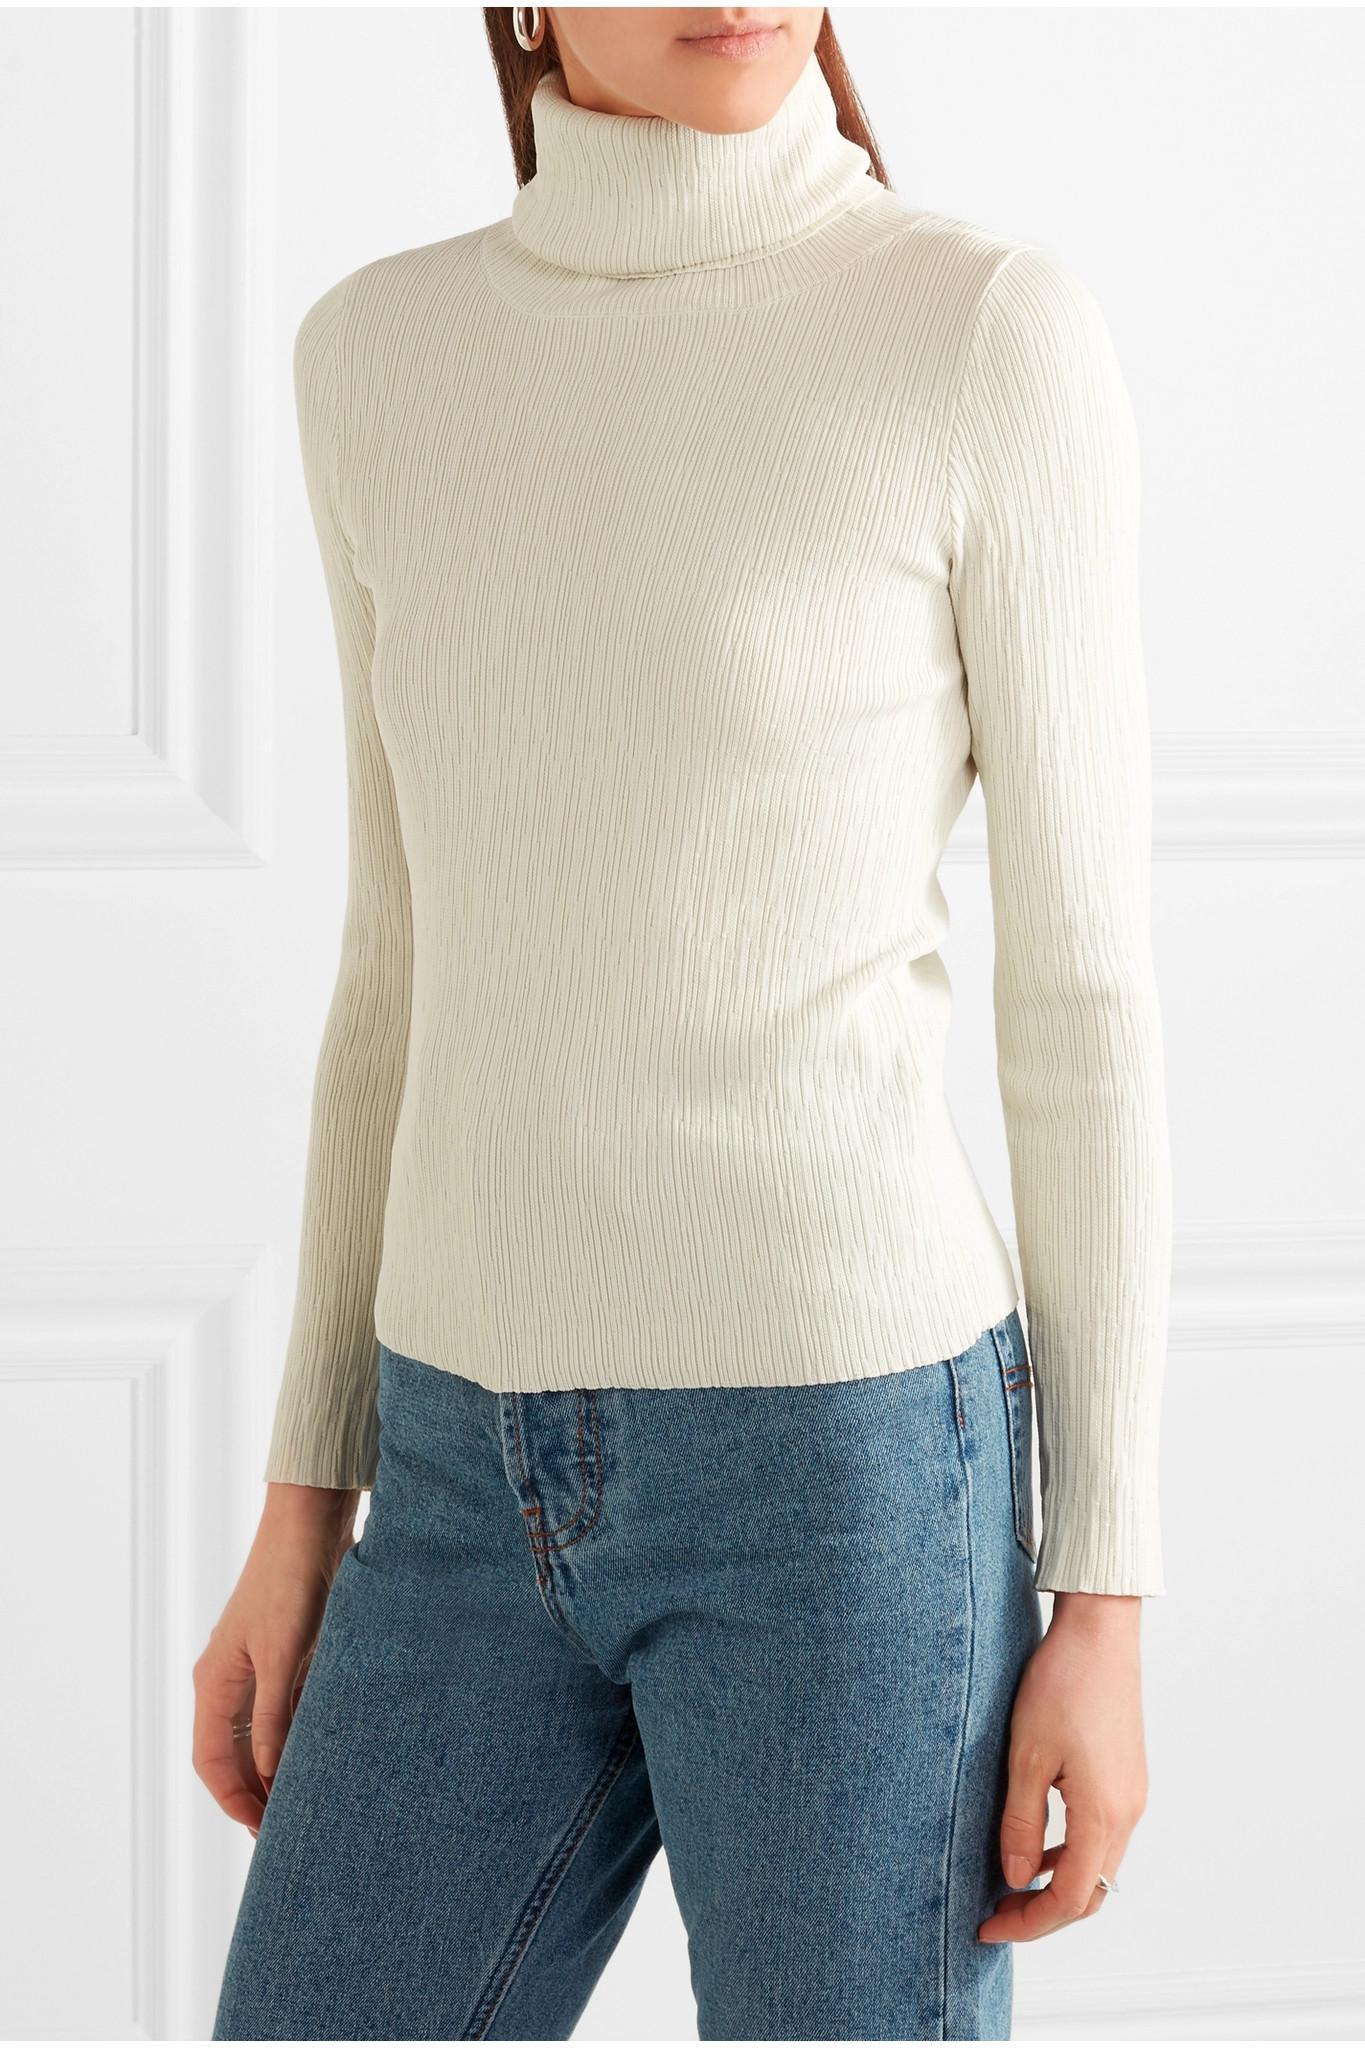 86b33082882199 Simon Miller Berto Ribbed-knit Turtleneck Top - Lyst